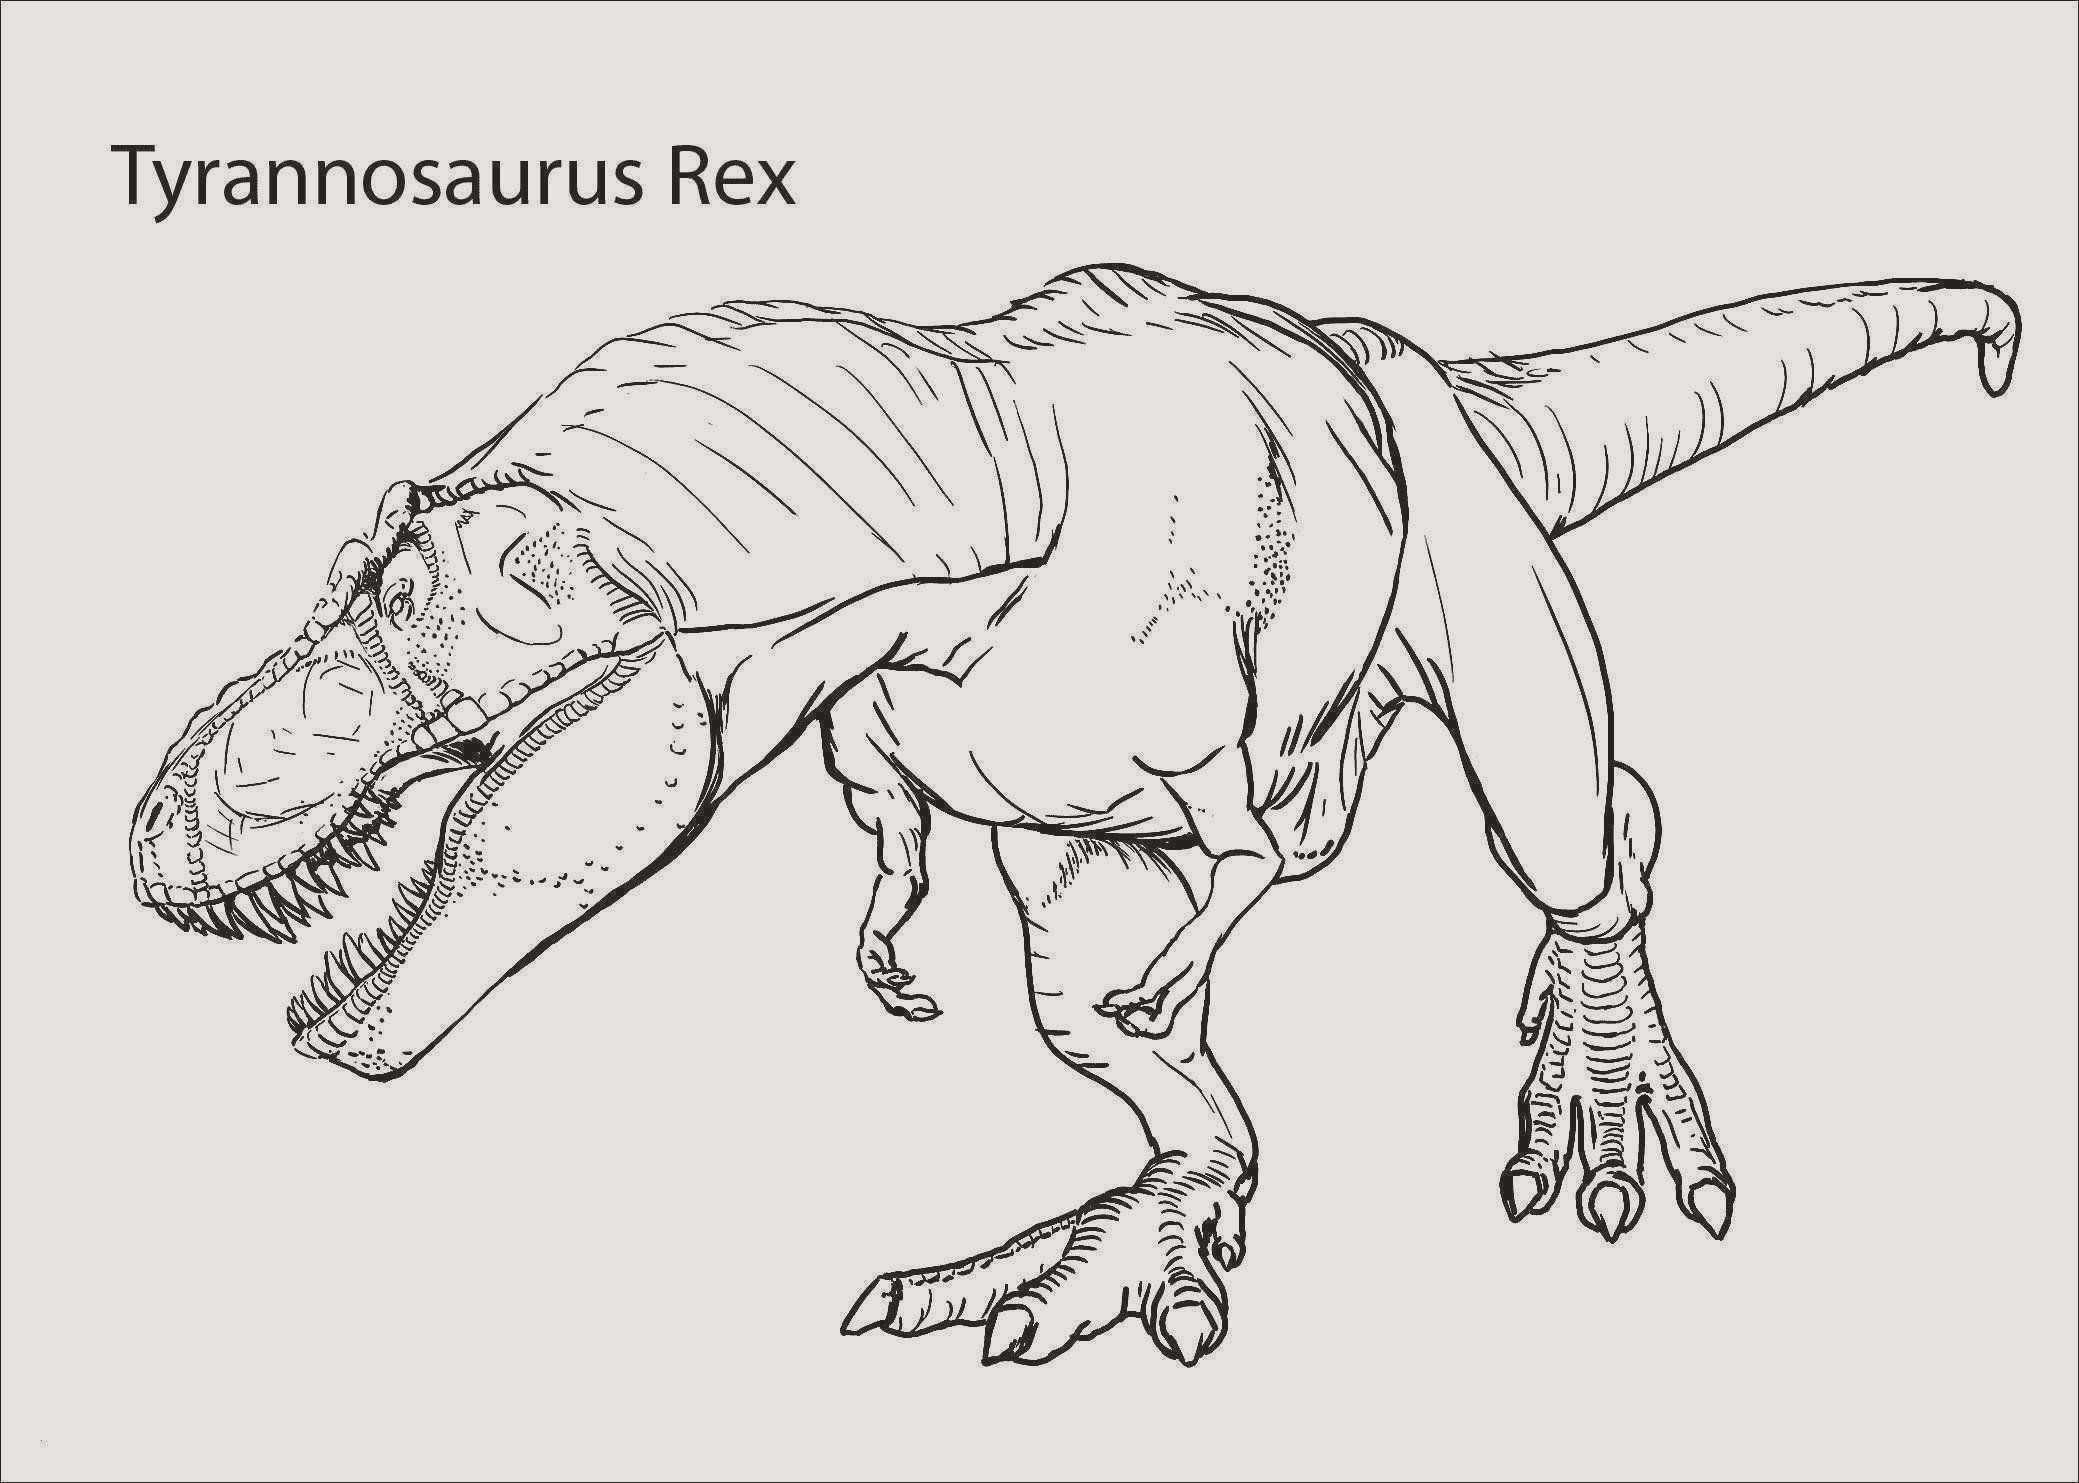 Jurassic Park Coloring Pages Best Of 30 Neu Tyrannosaurus Rex Ausmalbilder Ausdrucken